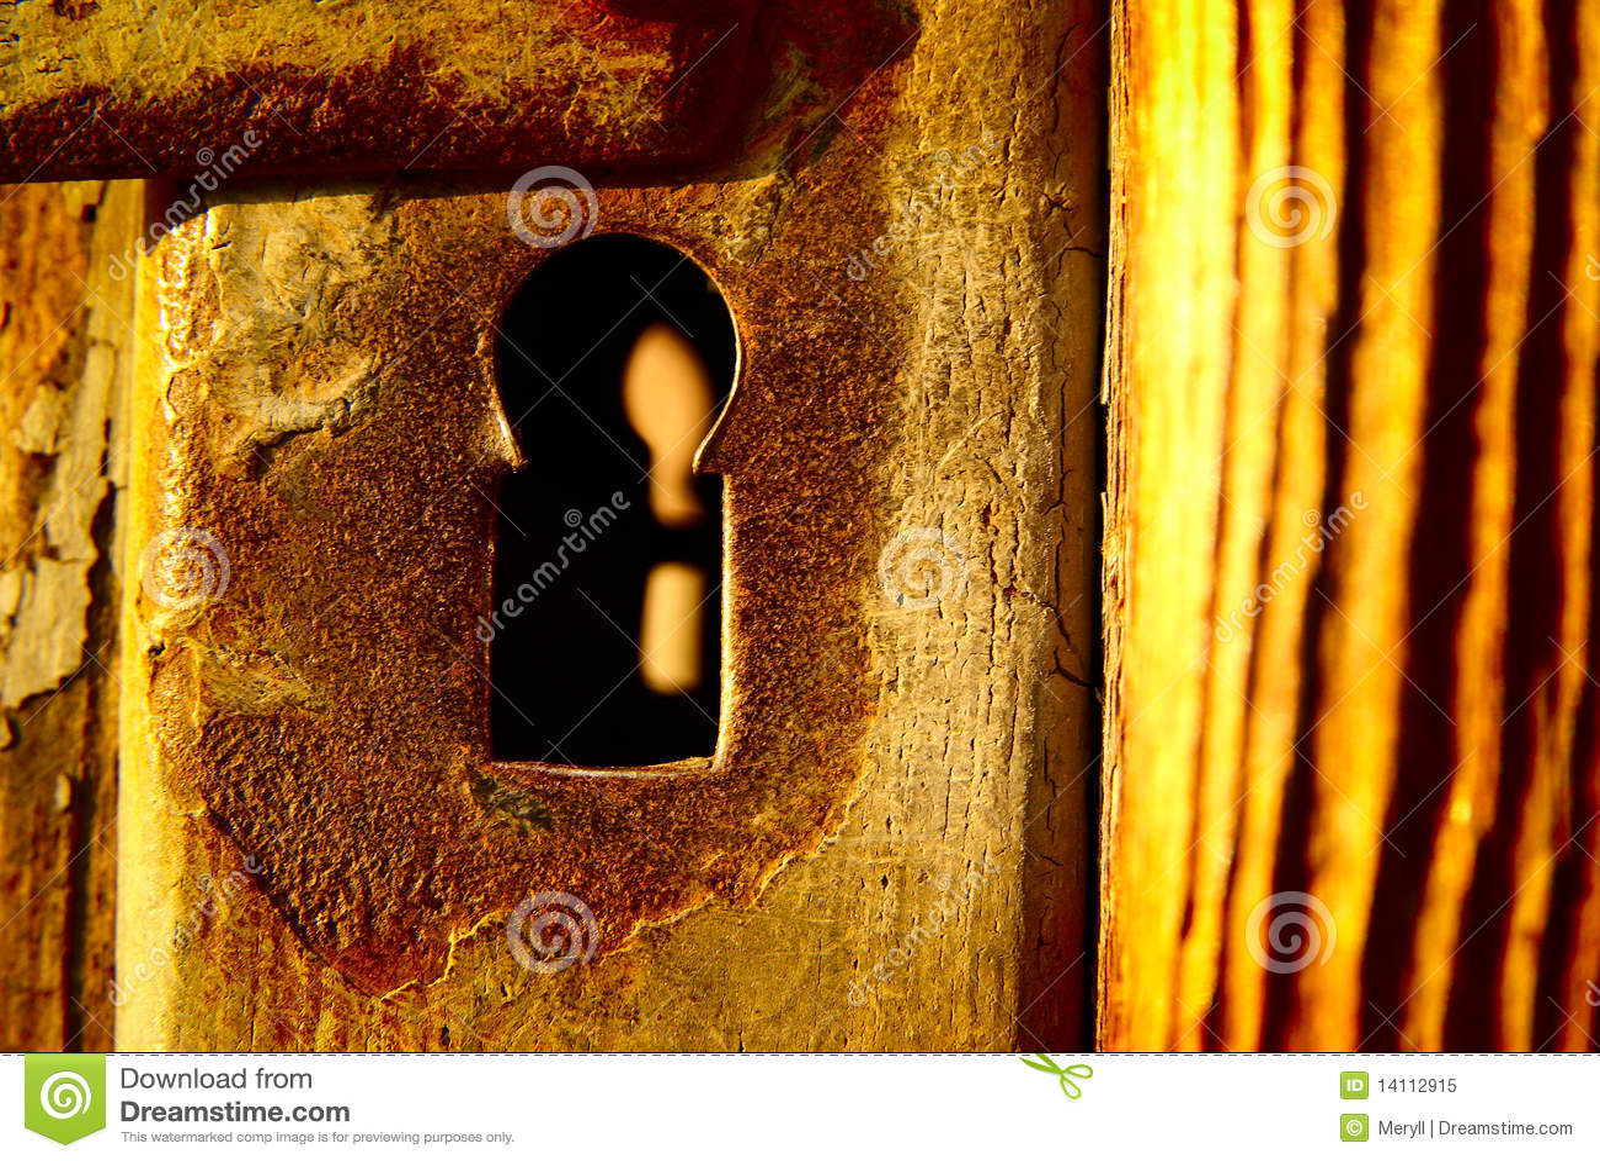 Secret Door Mystery Royalty Free Stock Photo Image 14112915